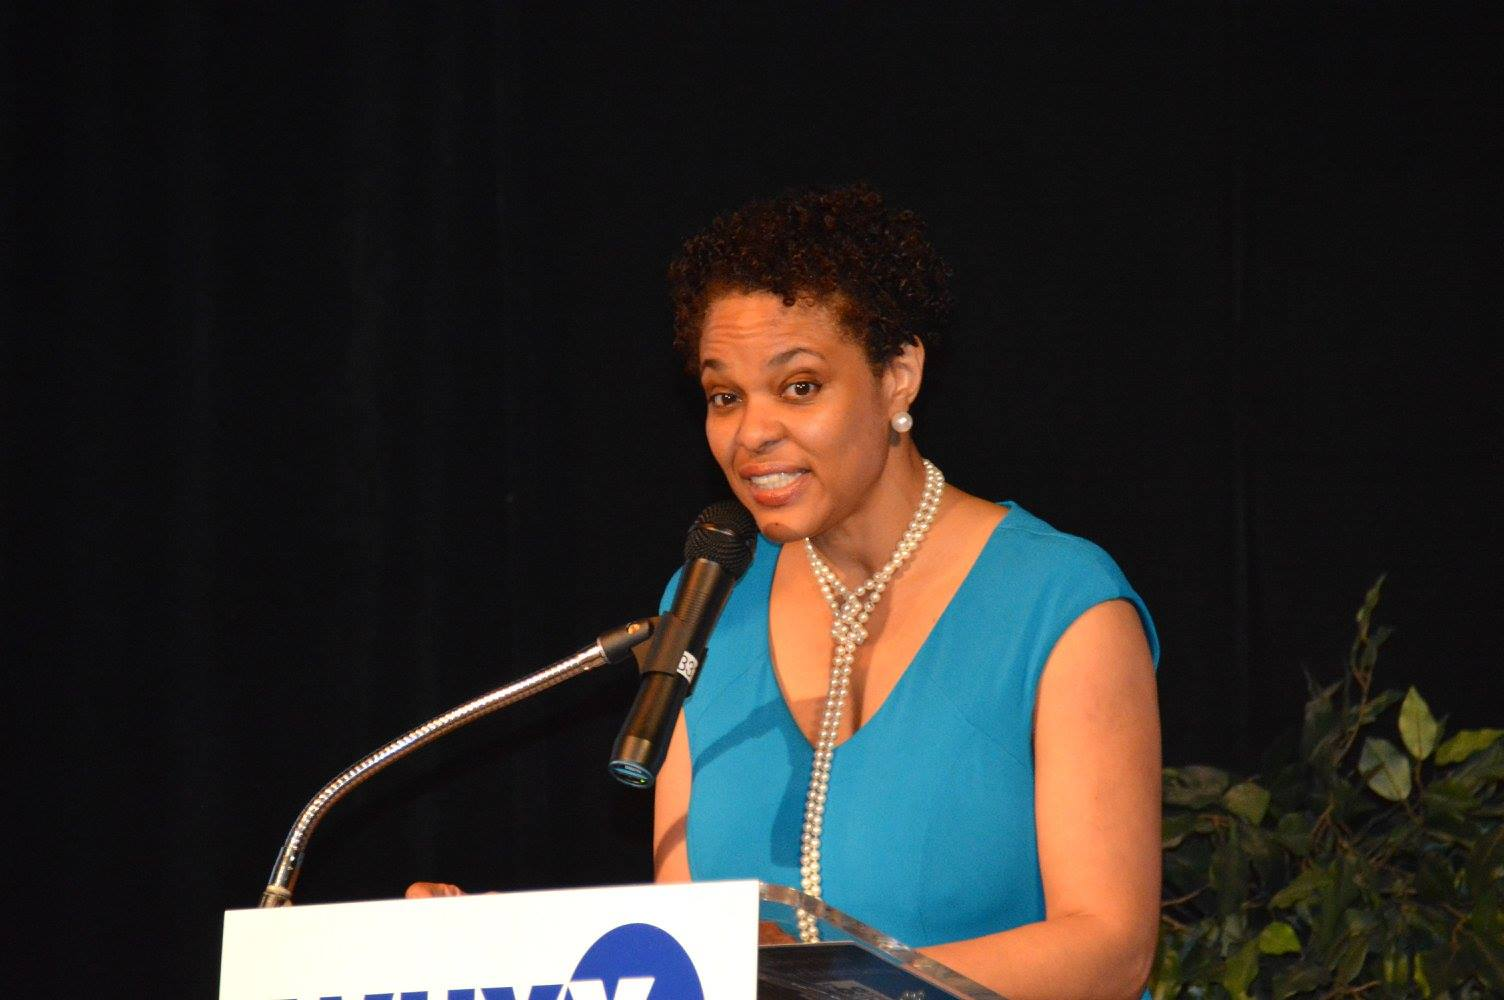 Pamela Rich-Wheeler    Mrs. Rich-Wheeler, a founding member of PBAN, is the Executive Director of the The Business Center in Philadelphia, Pennsylvania. The Business Center serves emerging small businesses in Philadelphia.  Mrs. Rich-Wheeler is a two-time Pitt graduate.